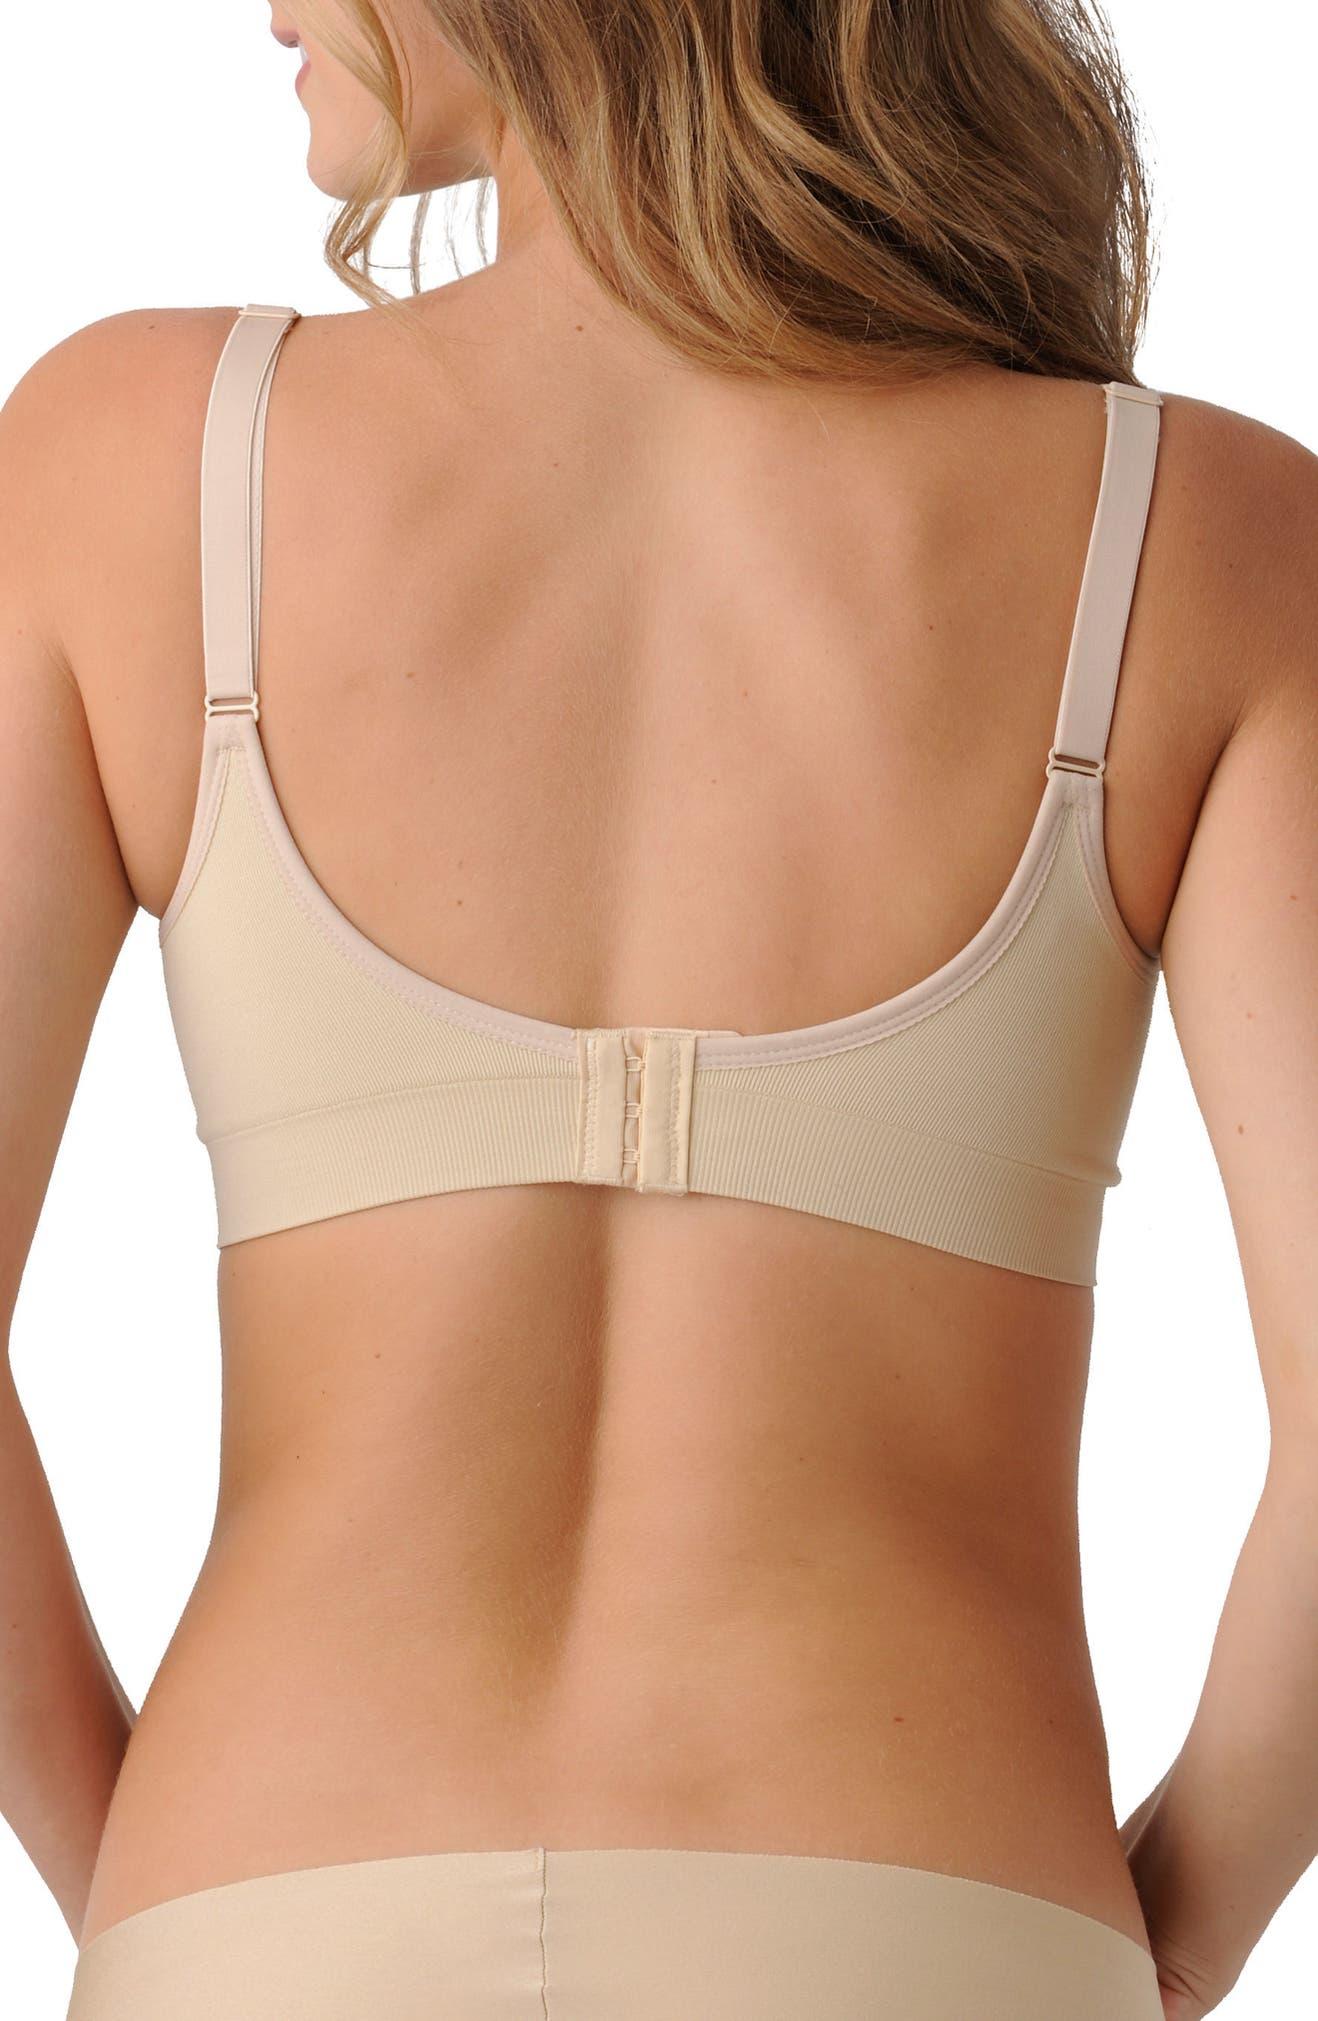 8b6cdb3cfacf0 Belly Bandit® 'Bandita' Nursing Bra | Nordstrom